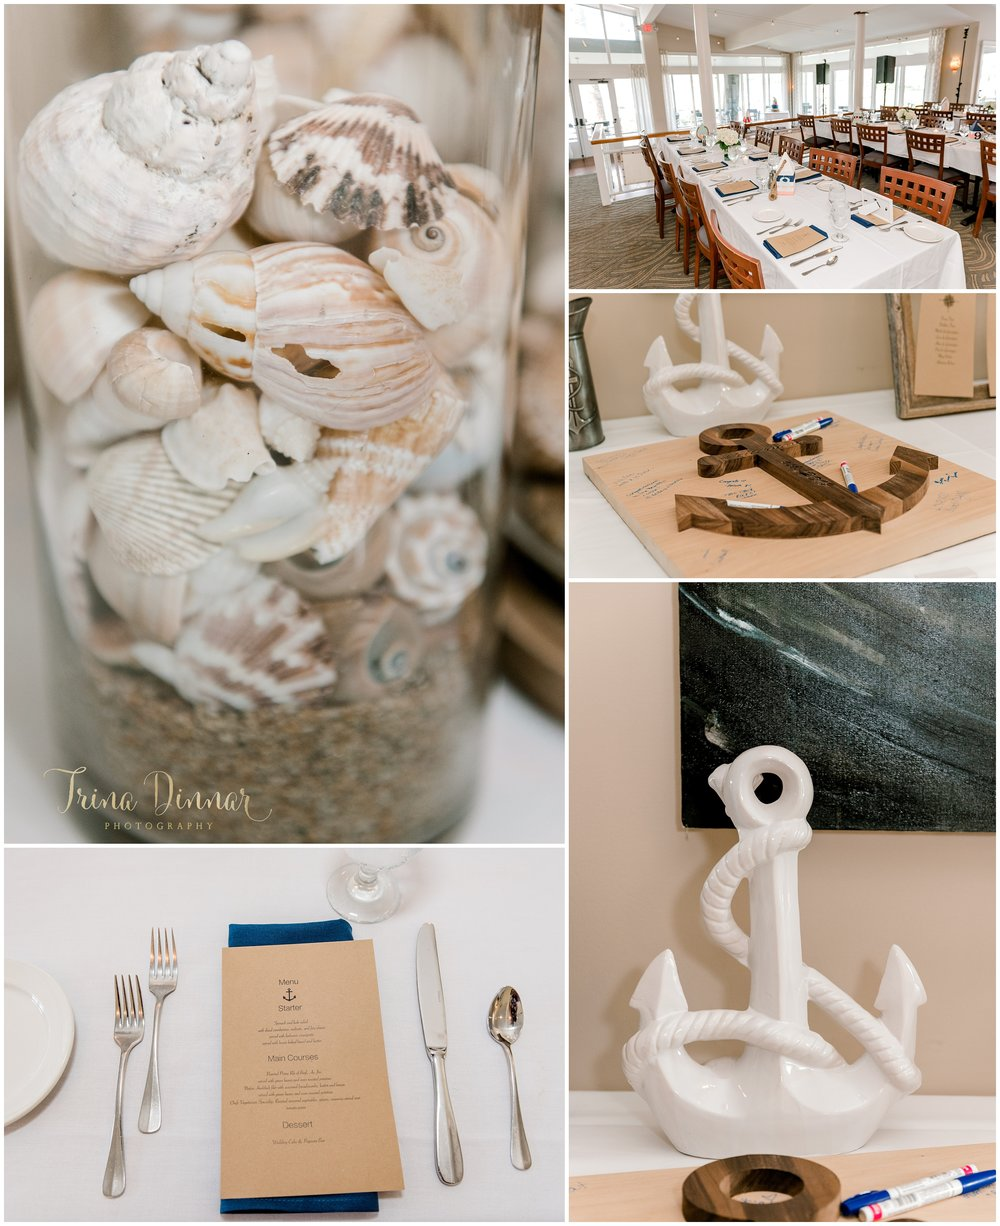 York Harbor Dockside Nautical Wedding Venue